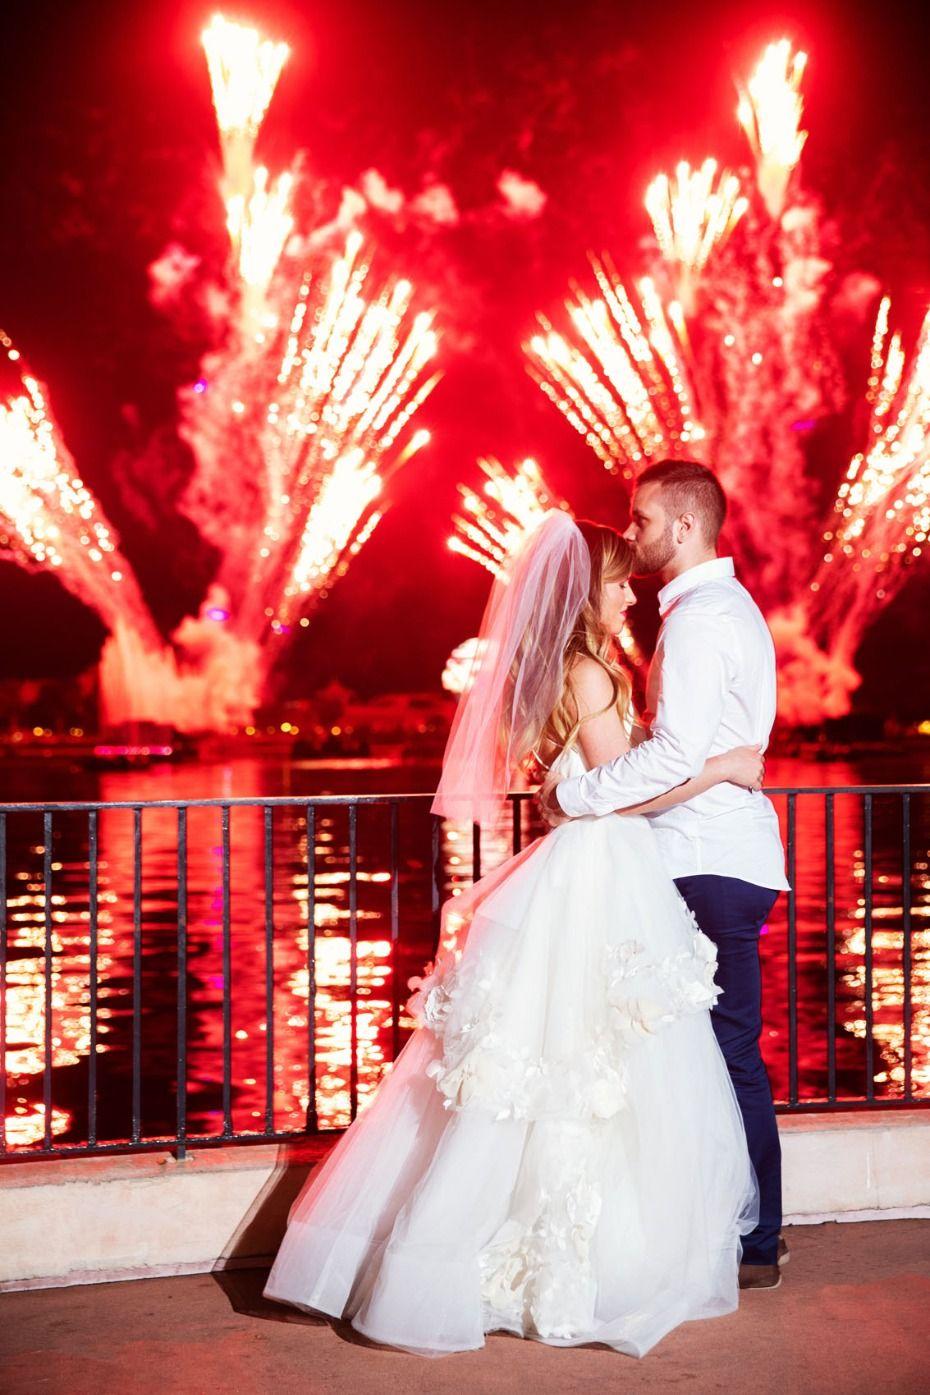 Disney Wedding Cost.This Is How Much A Disney World Wedding Costs Everything Wedding